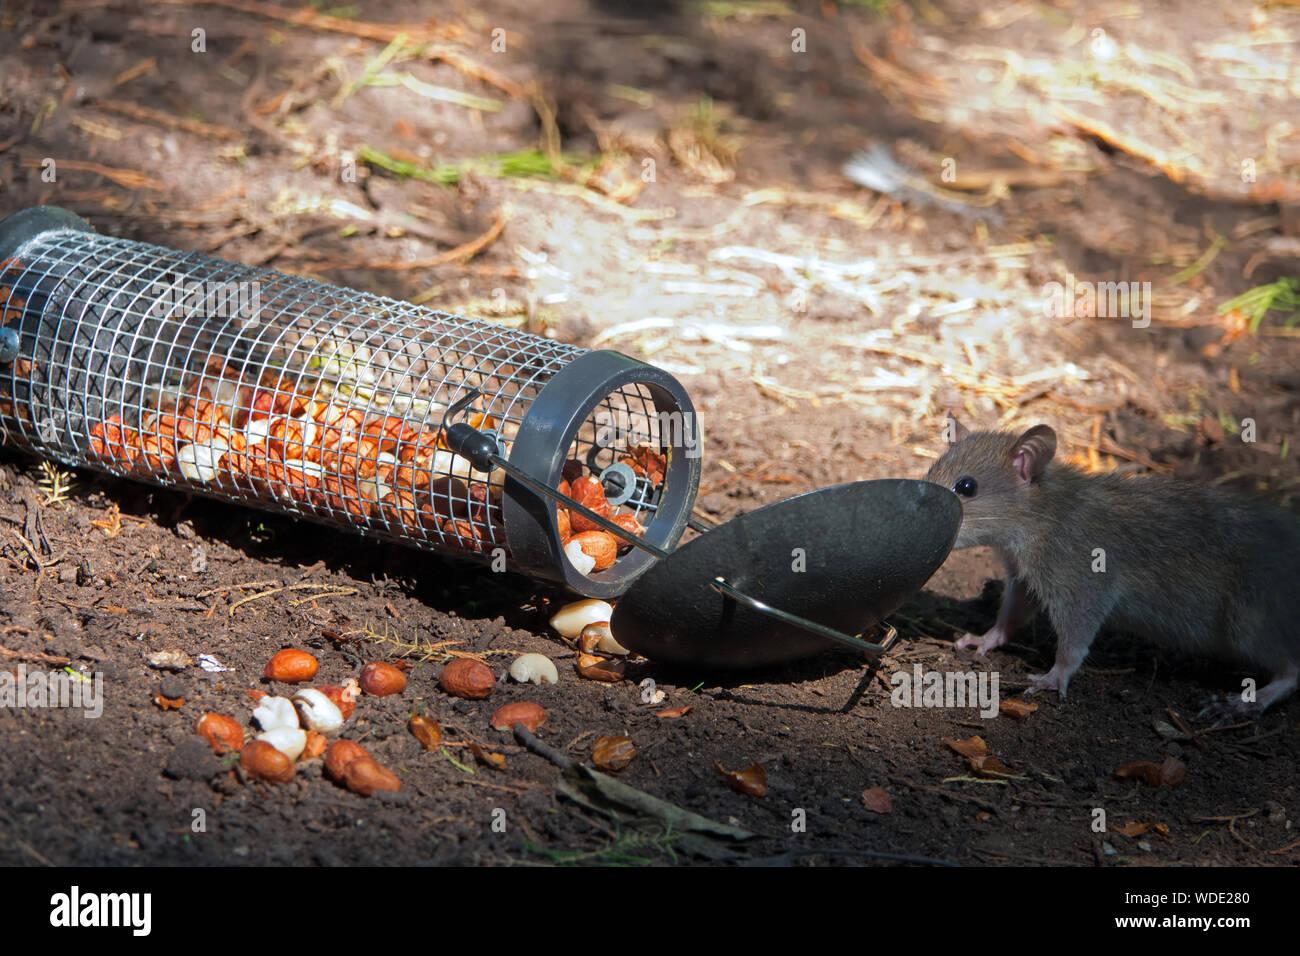 Bird Feeder Rat Stock Photos & Bird Feeder Rat Stock Images